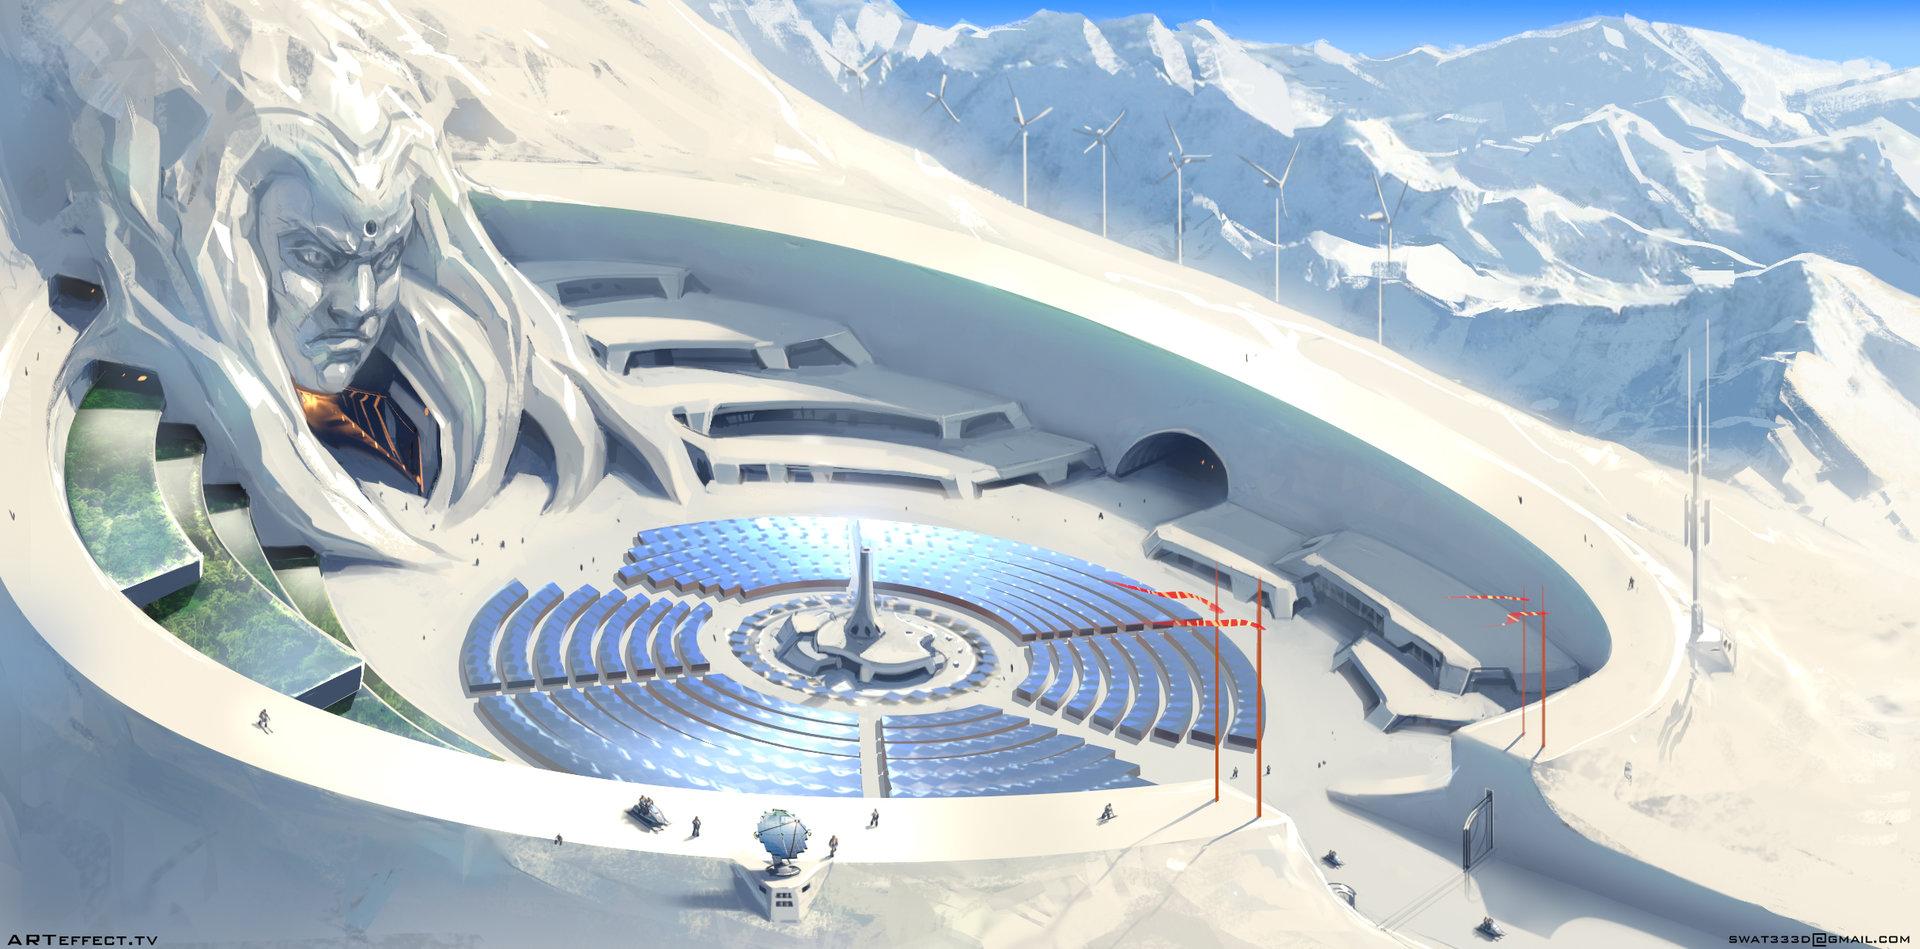 Sviatoslav gerasimchuk snow planet